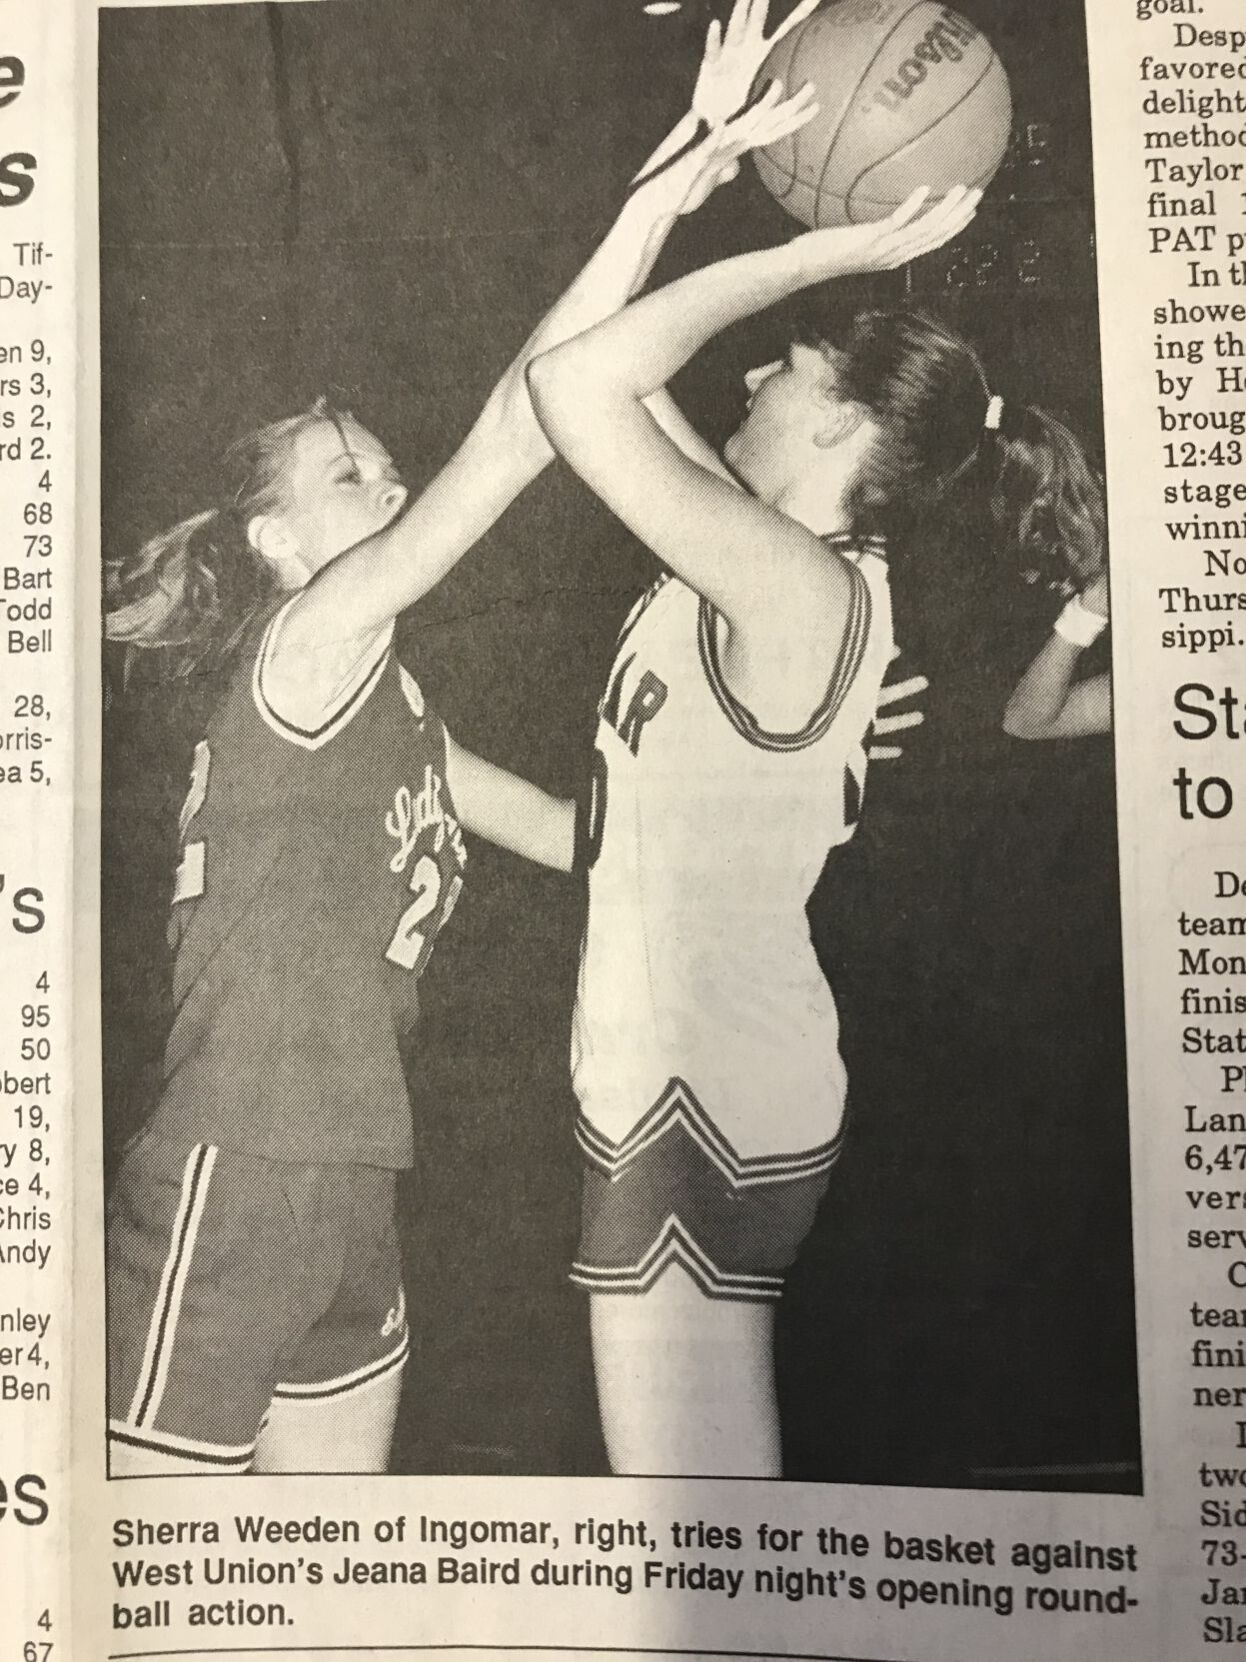 Ingomar and West Union basketball